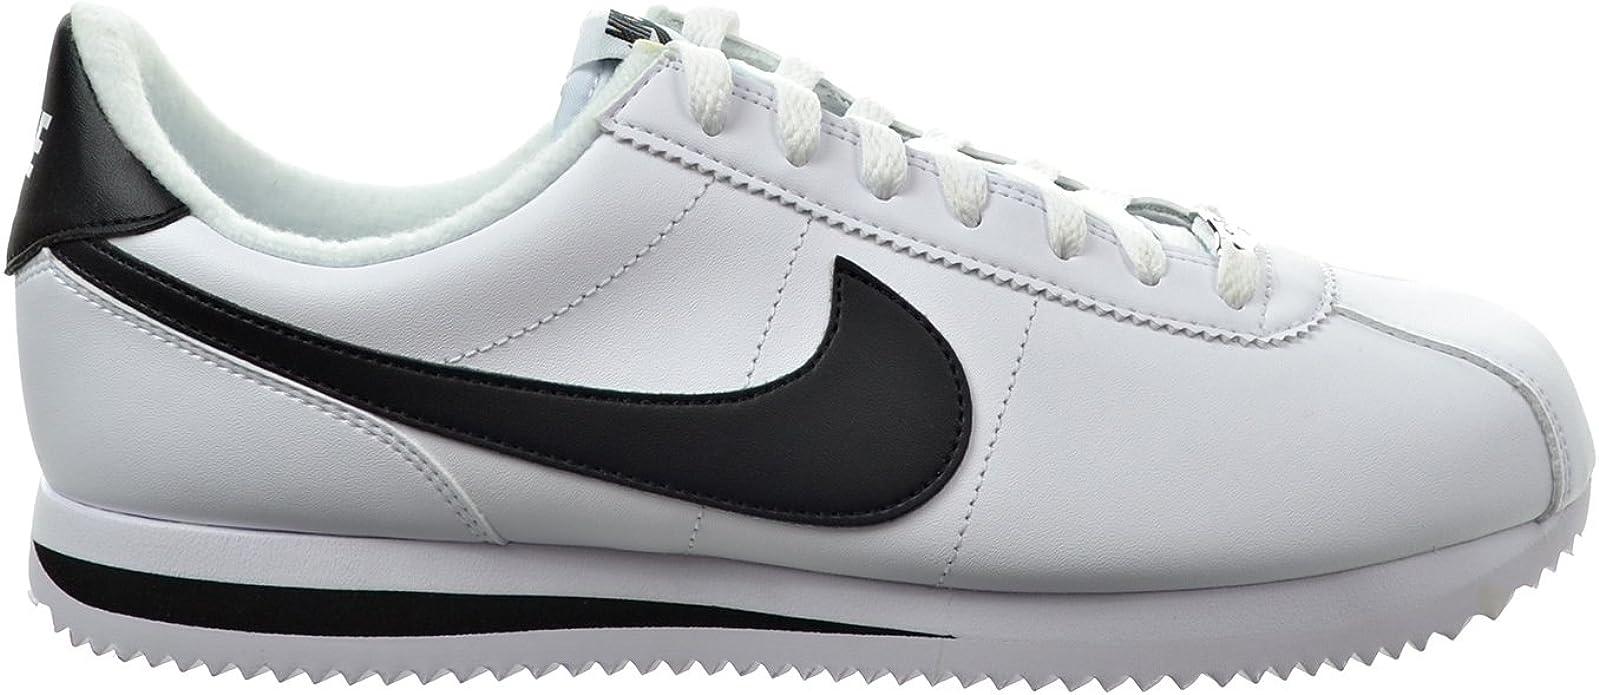 Nike Men's Classic Cortez Leather